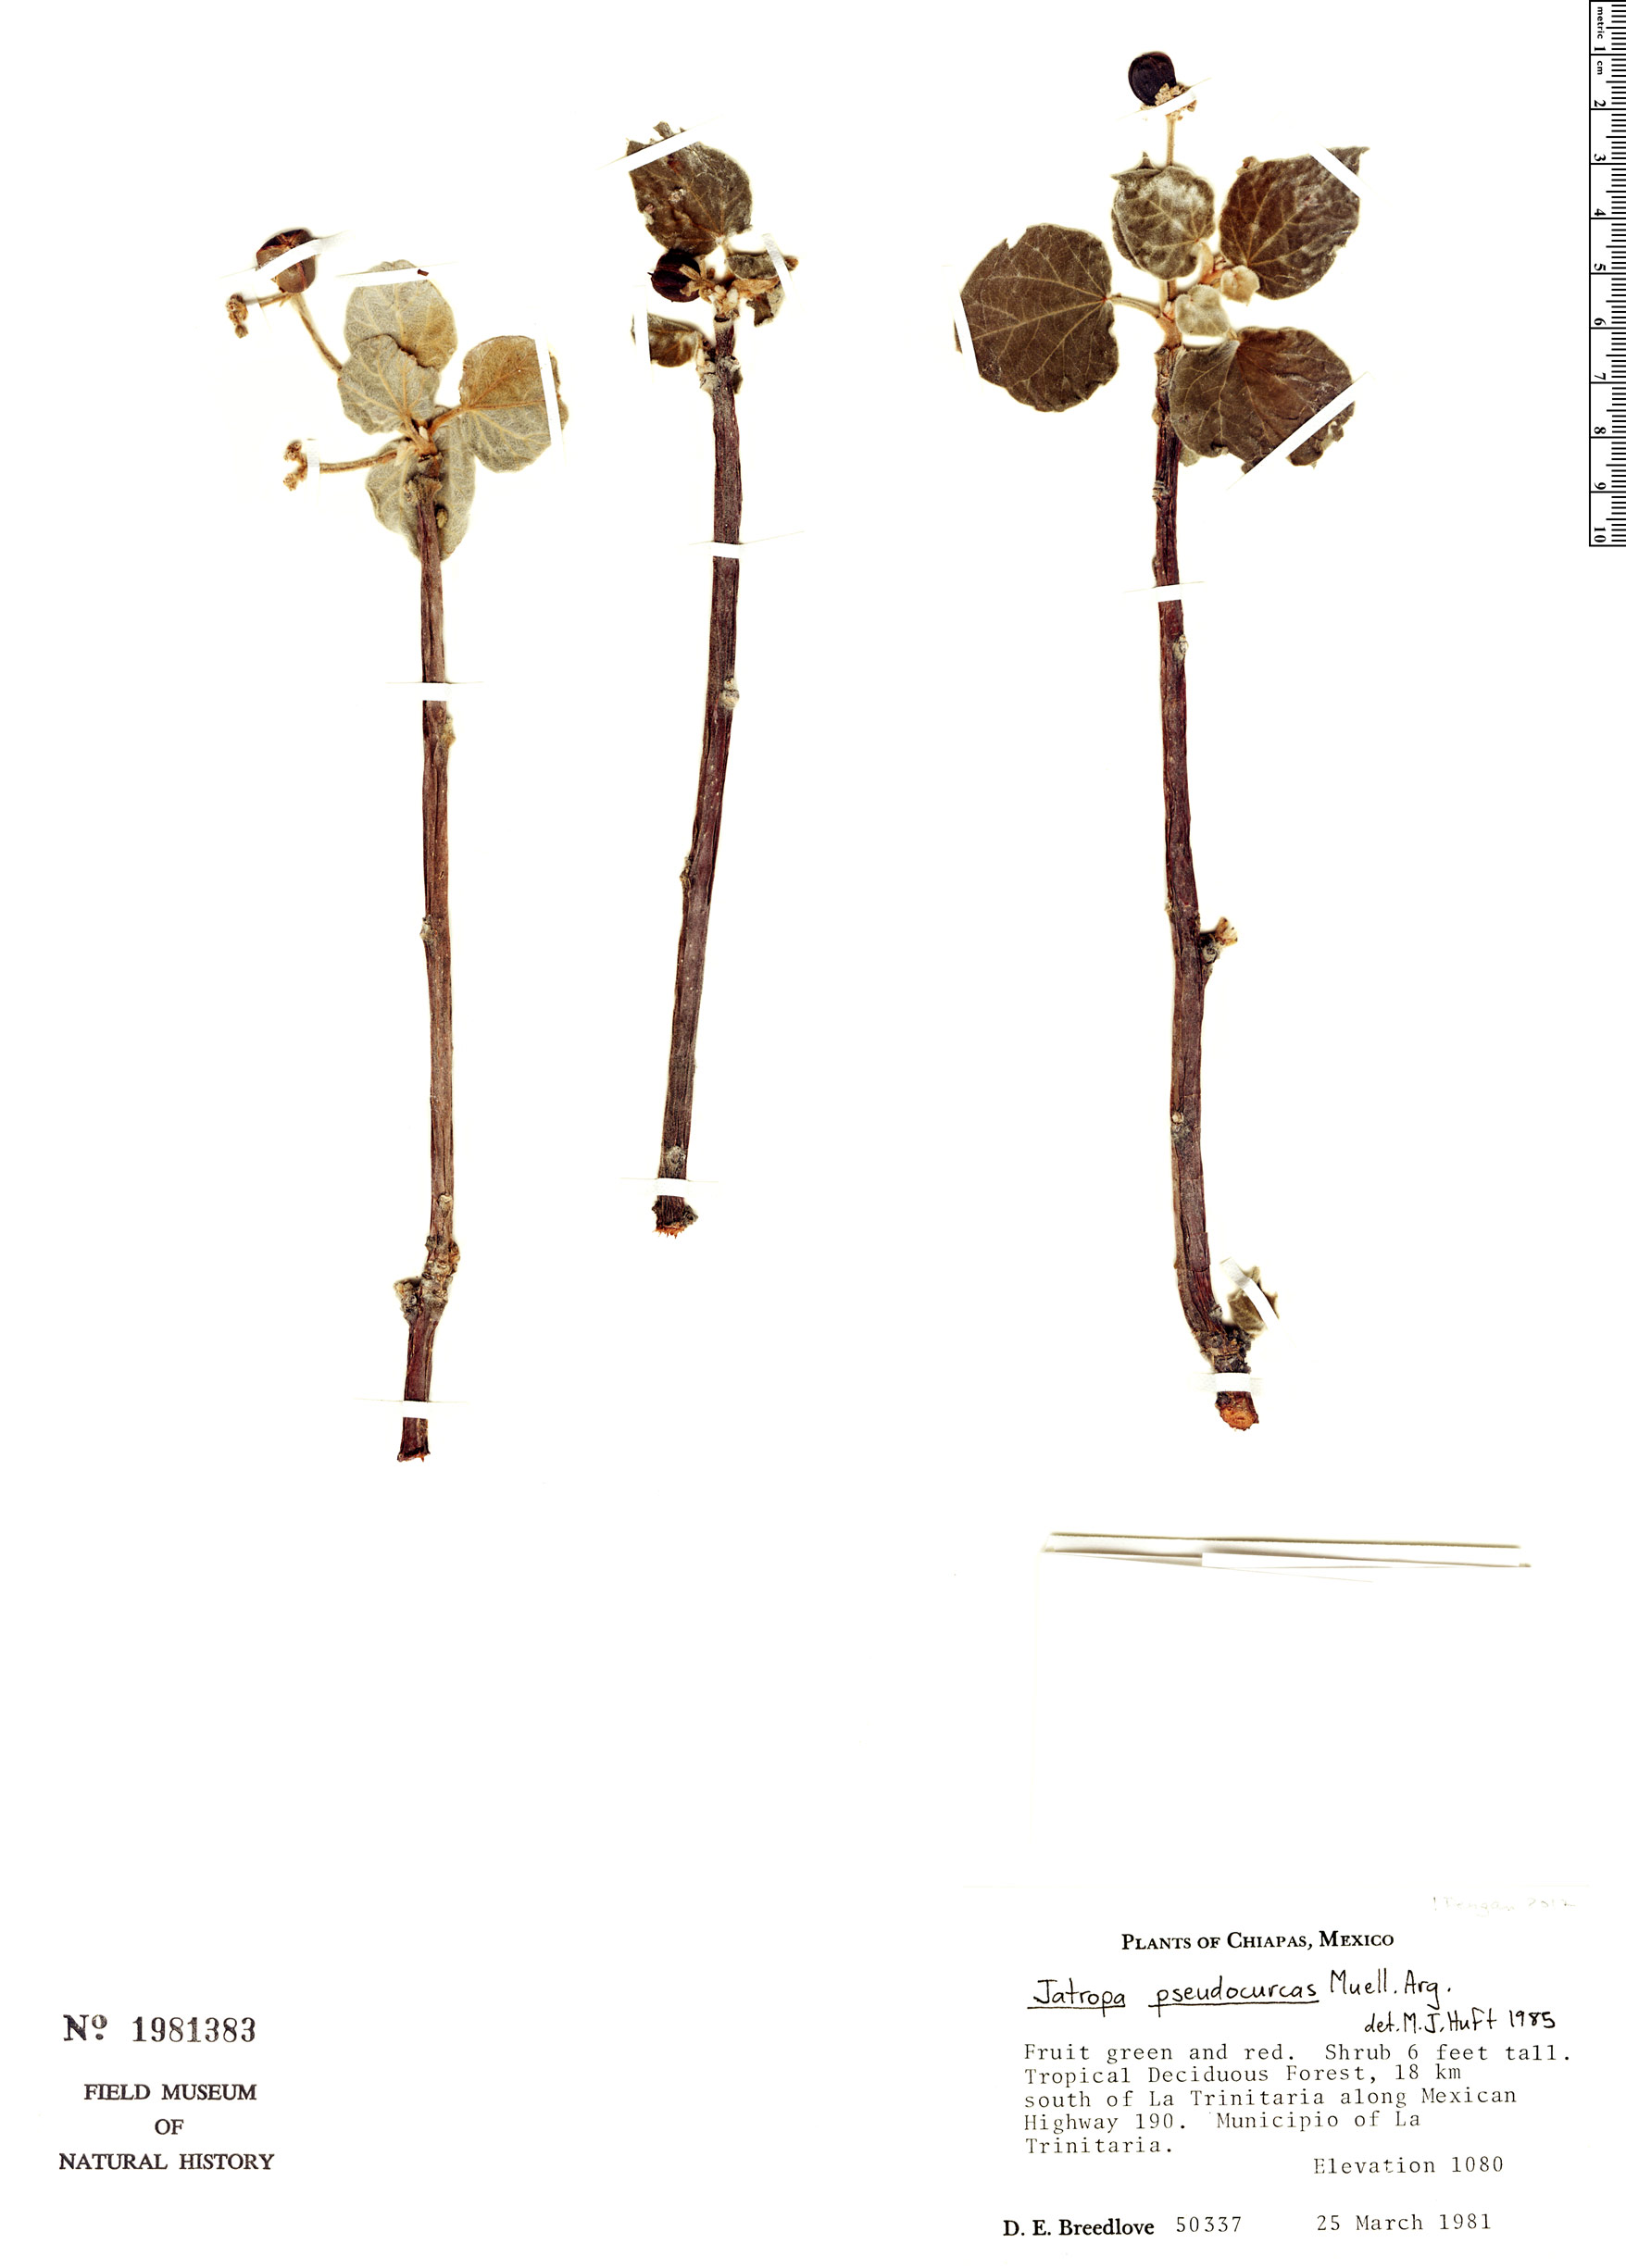 Specimen: Jatropha pseudocurcas